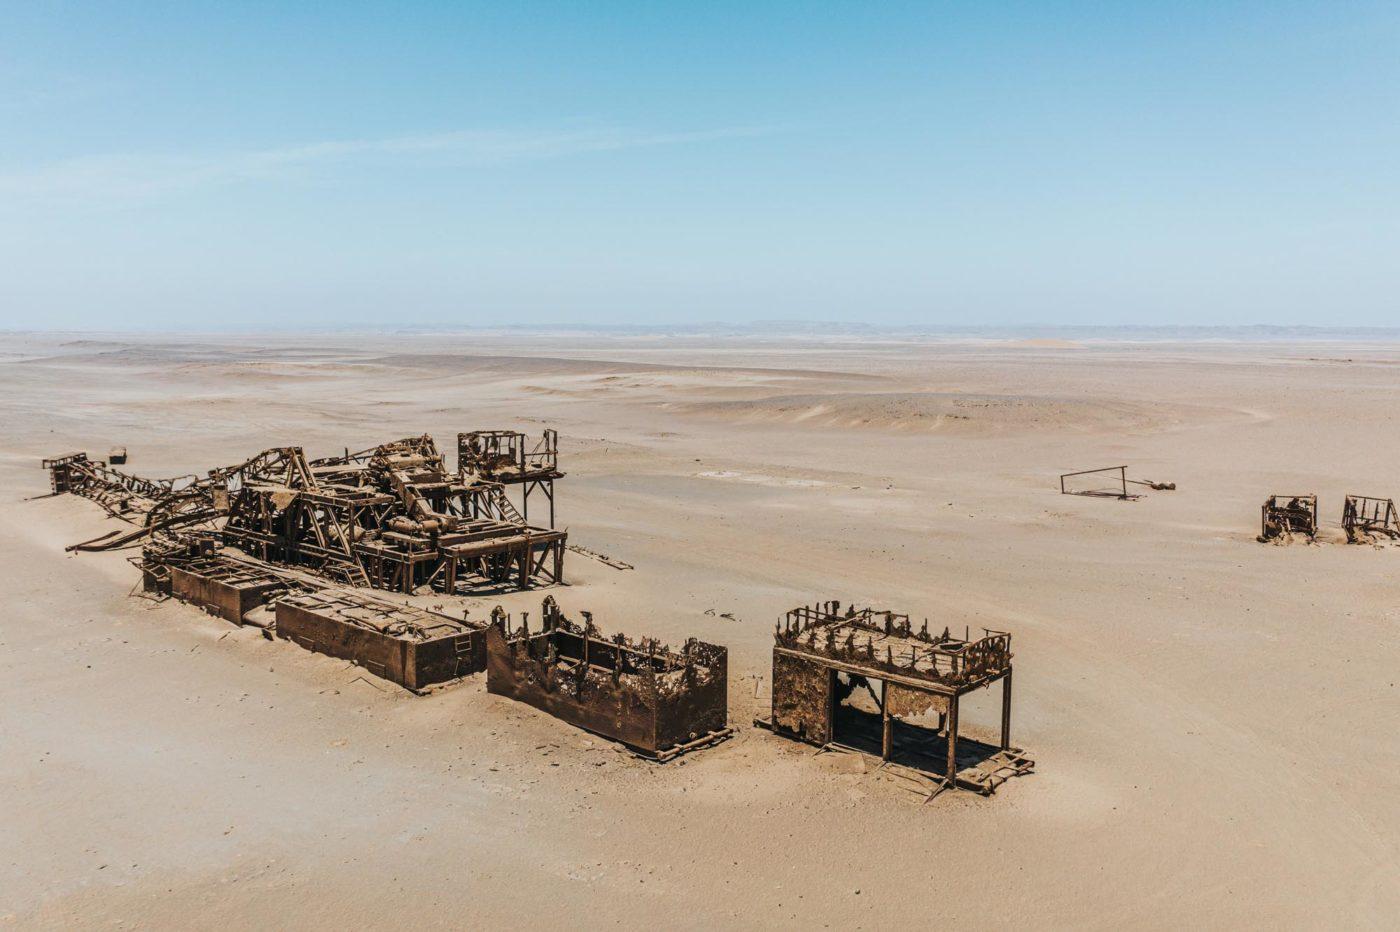 Collapsed oil rig, Skeleton Coast